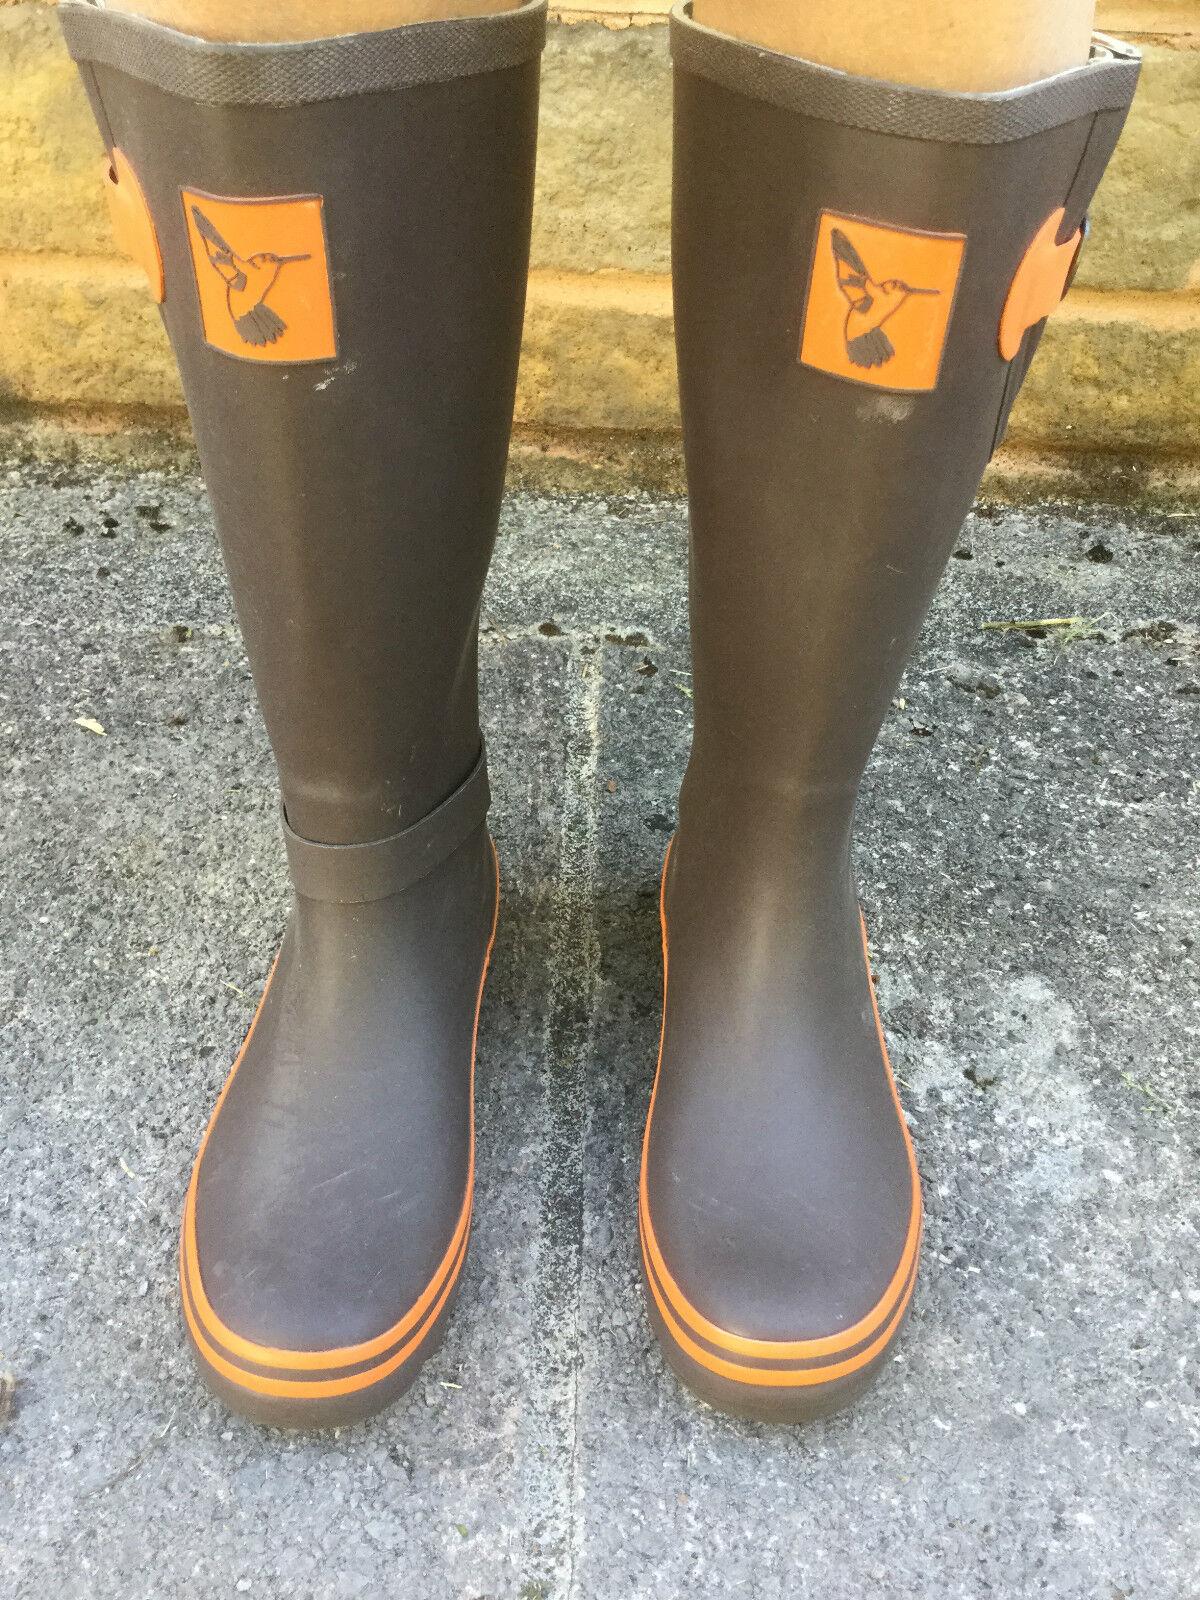 Evercreatures Terracotta Festival Wellies Wellington Boots - Brand New